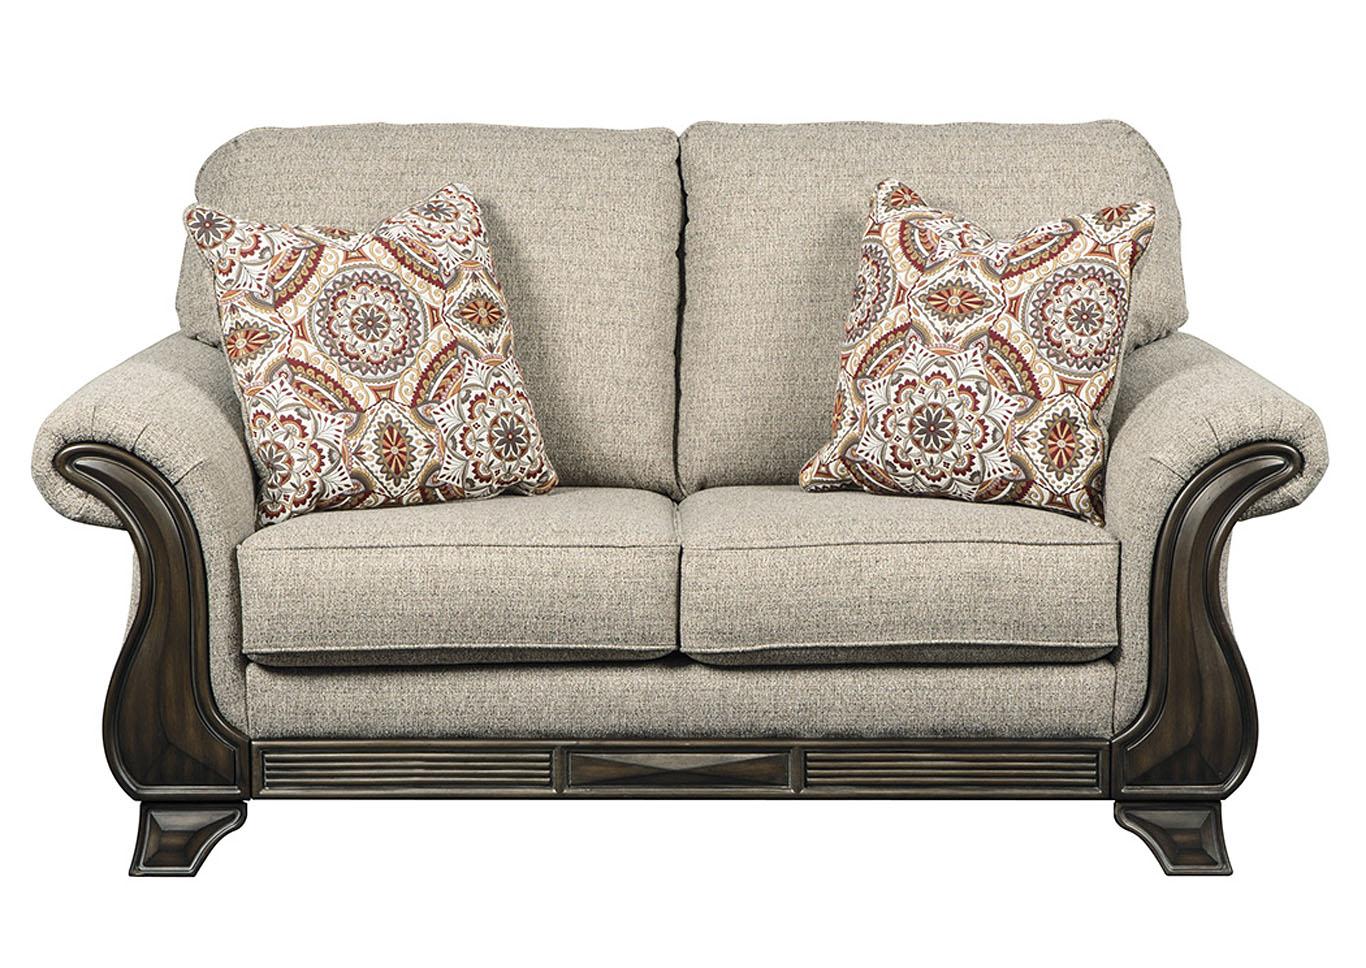 Incredible Furniture Moc Claremorris Fog Loveseat Cjindustries Chair Design For Home Cjindustriesco